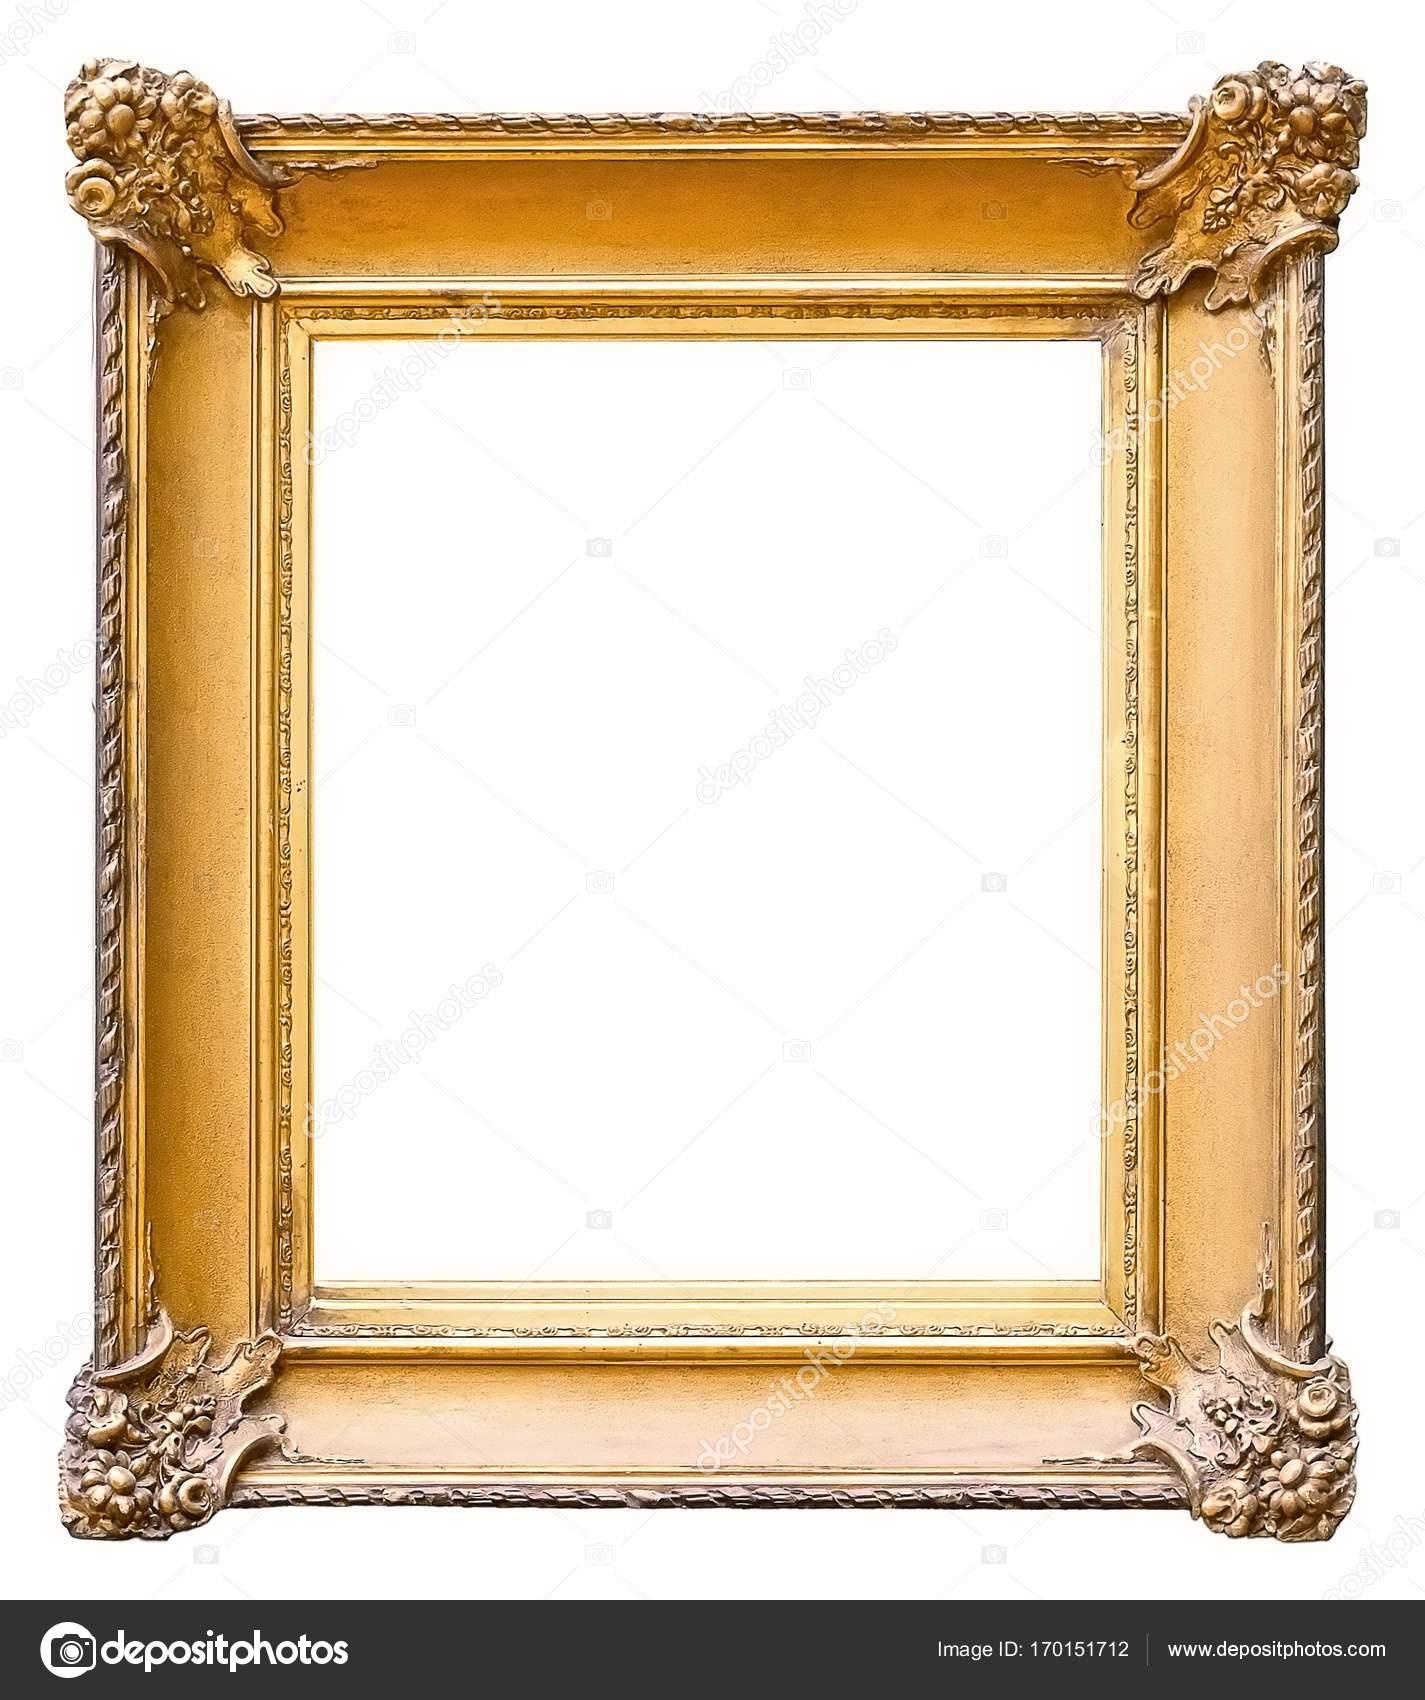 Oro marco para cuadros, espejos o fotos — Fotos de Stock © Prokrida ...